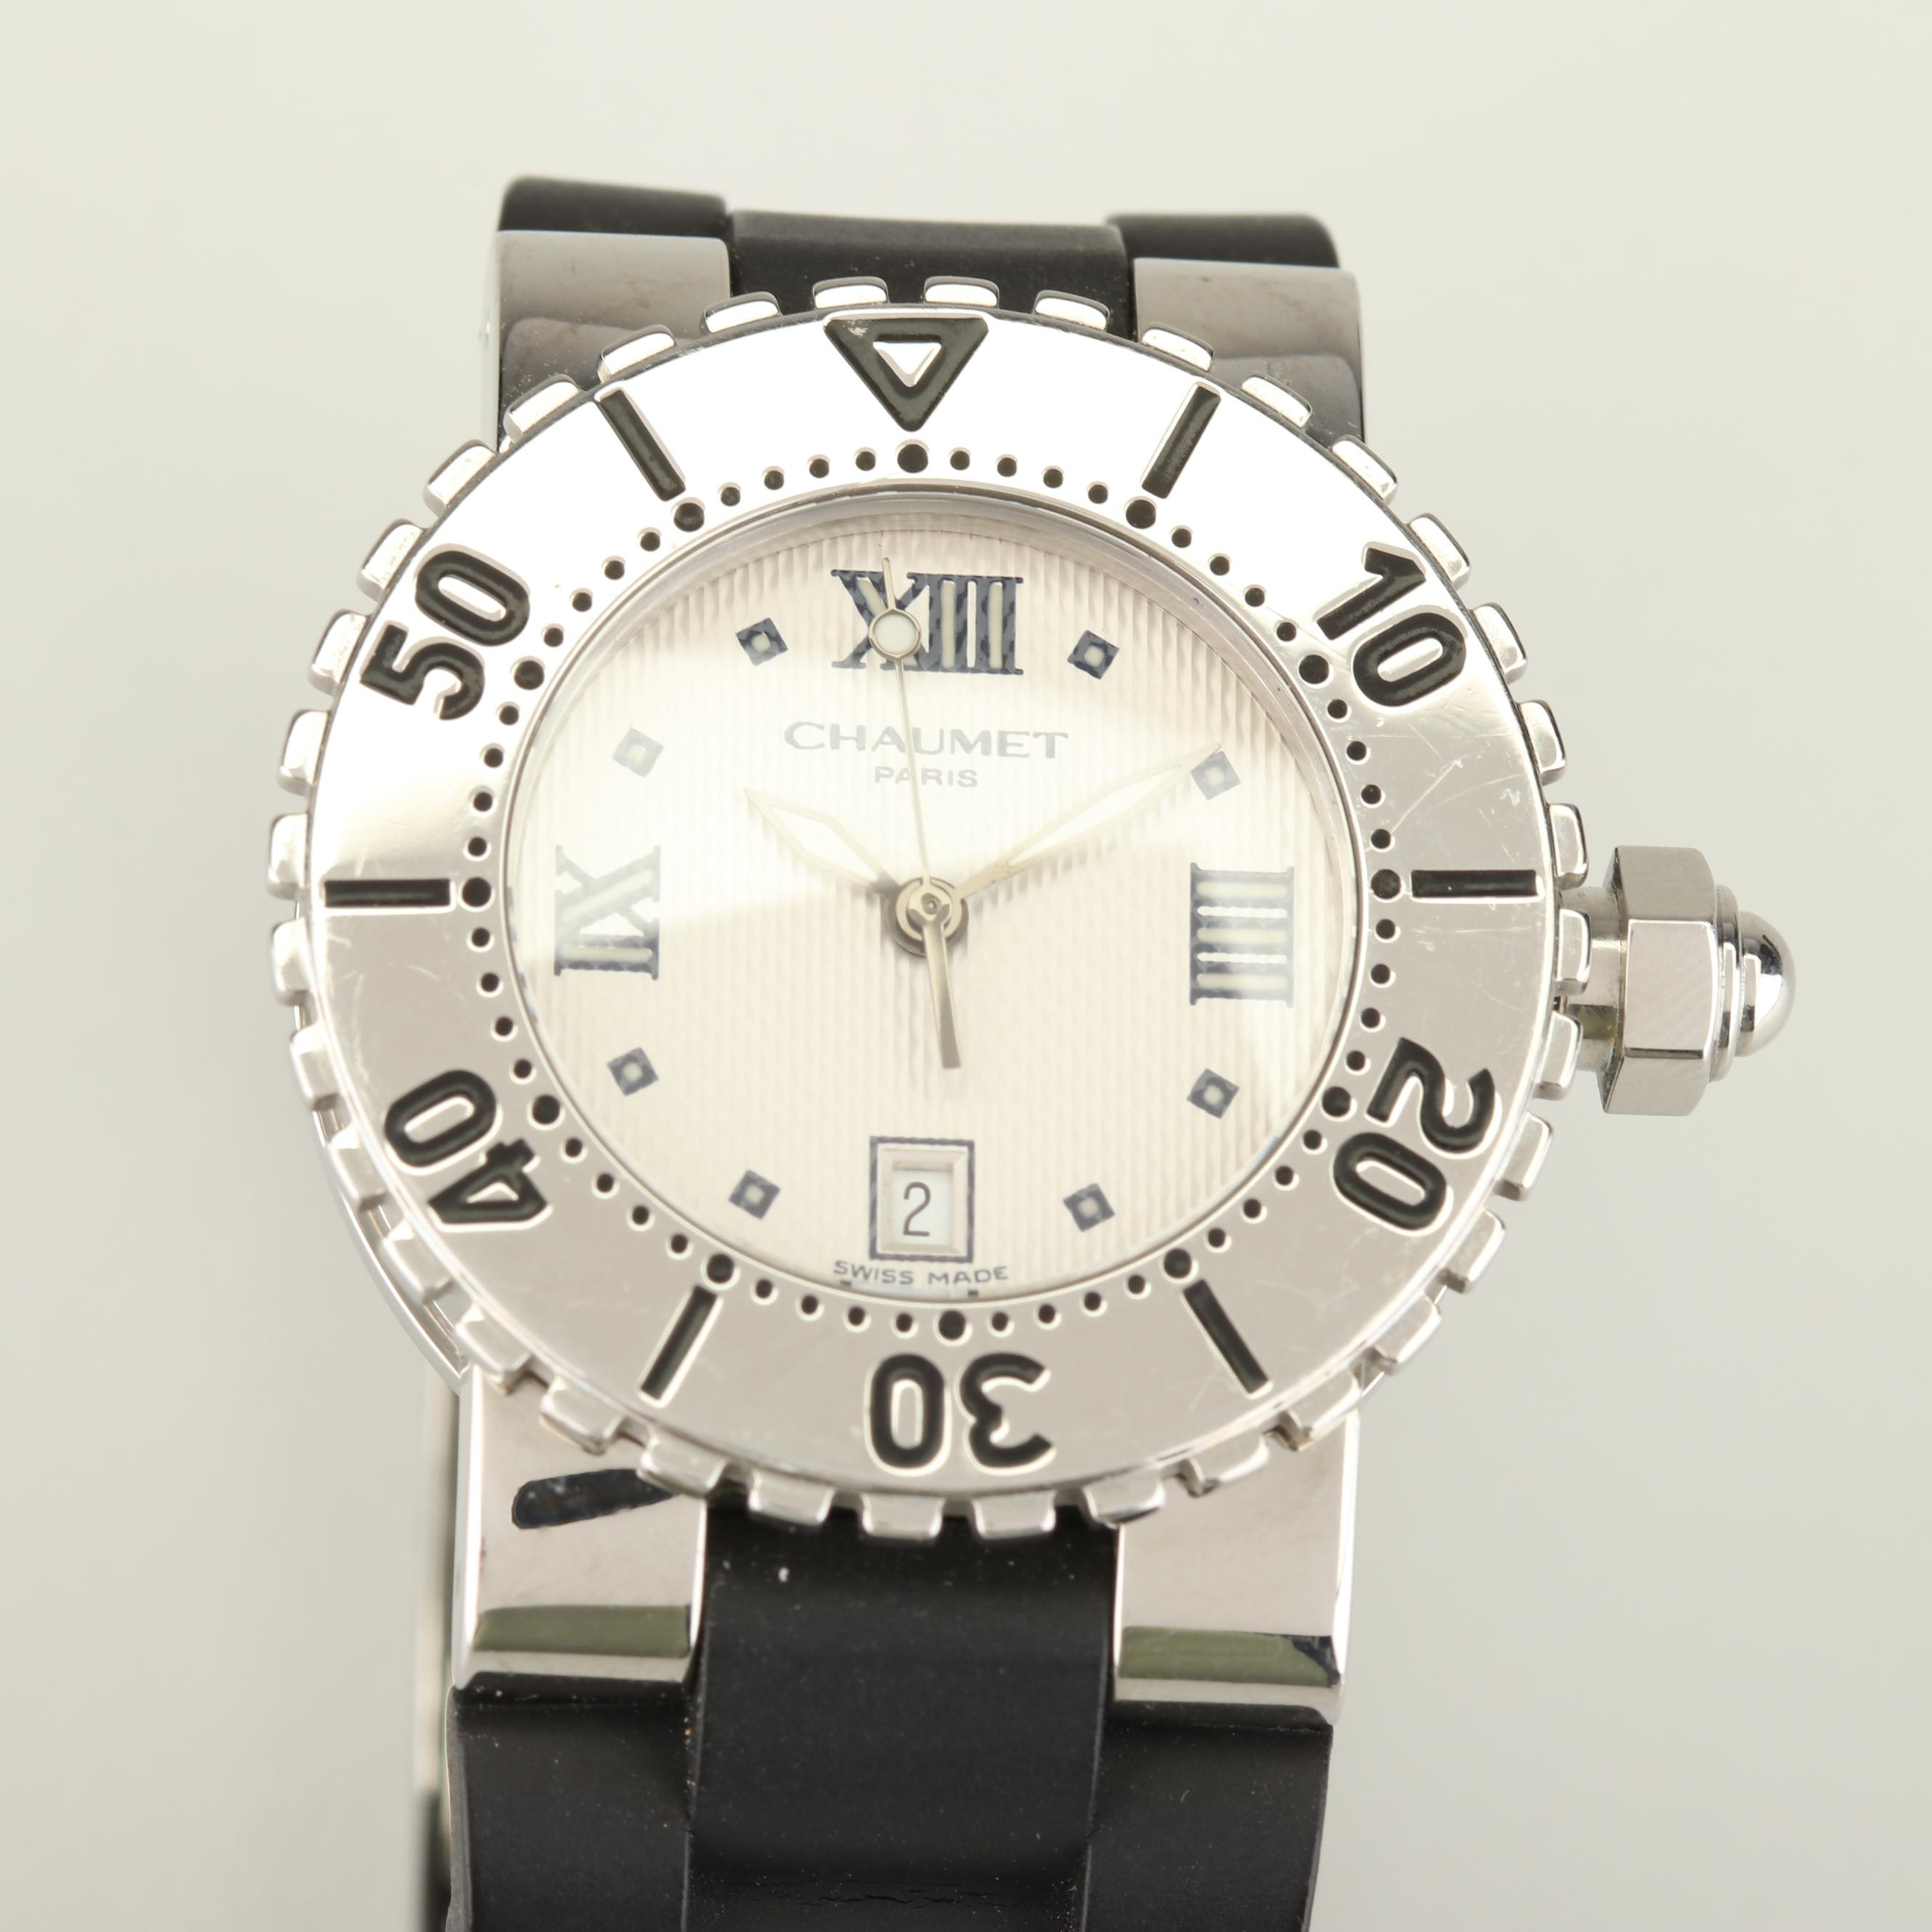 Chaumet Paris Stainless Steel Wristwatch